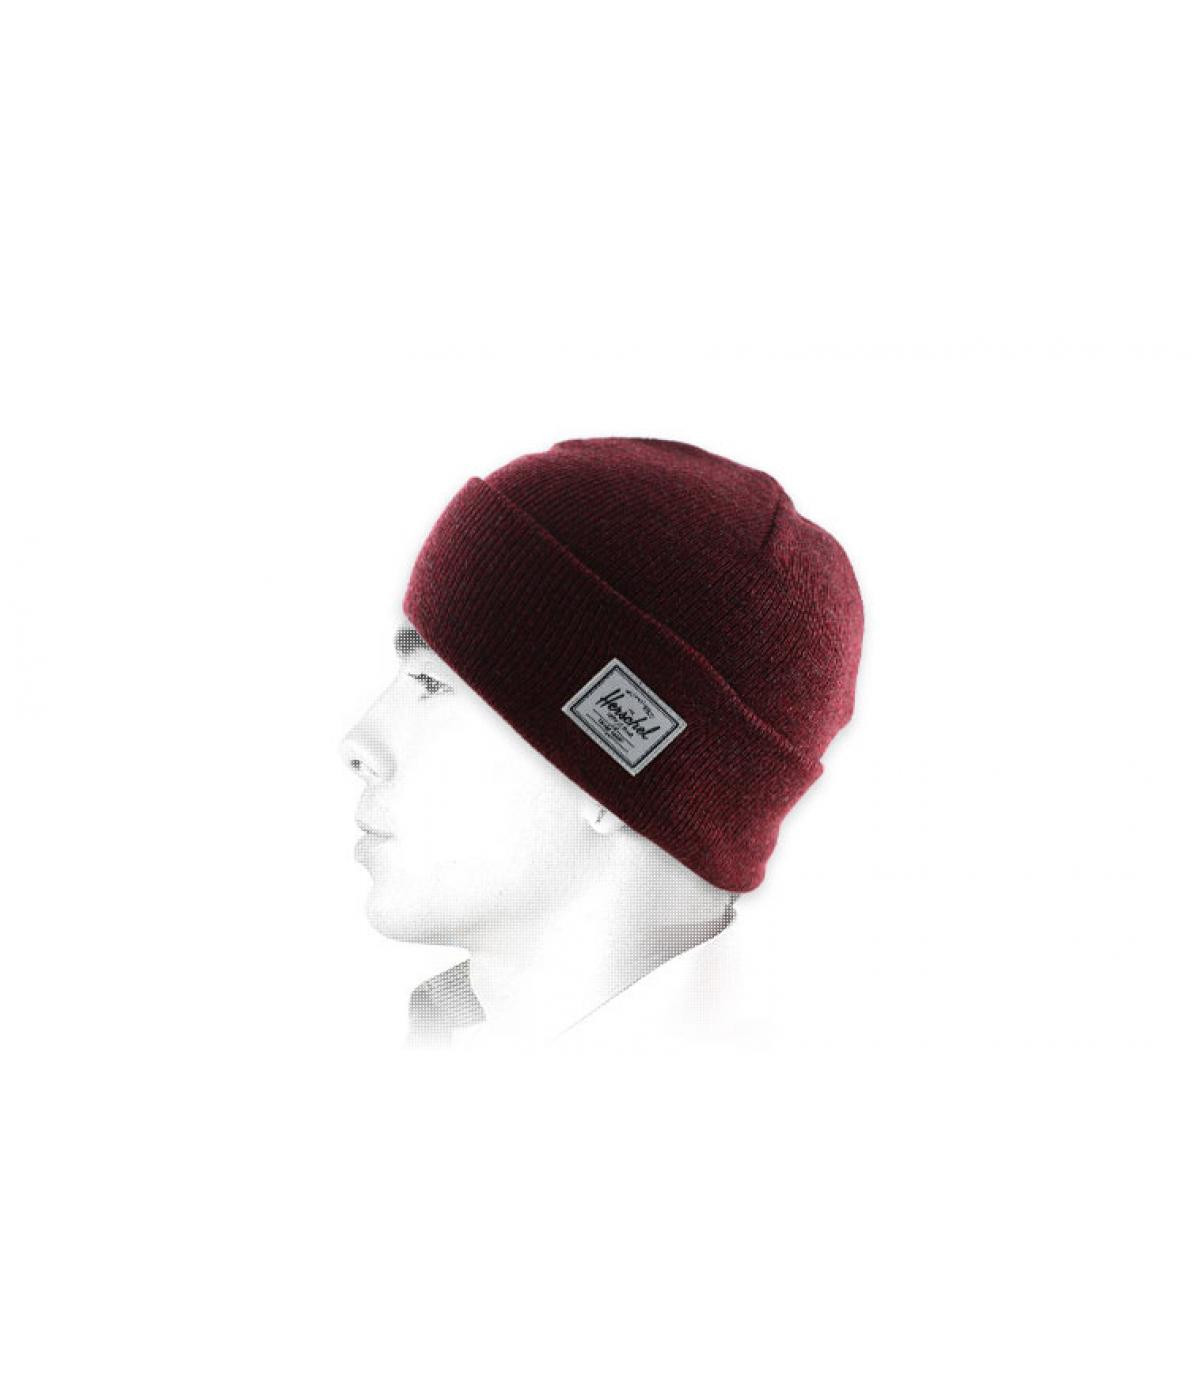 solapa marrón sombrero de Herschel